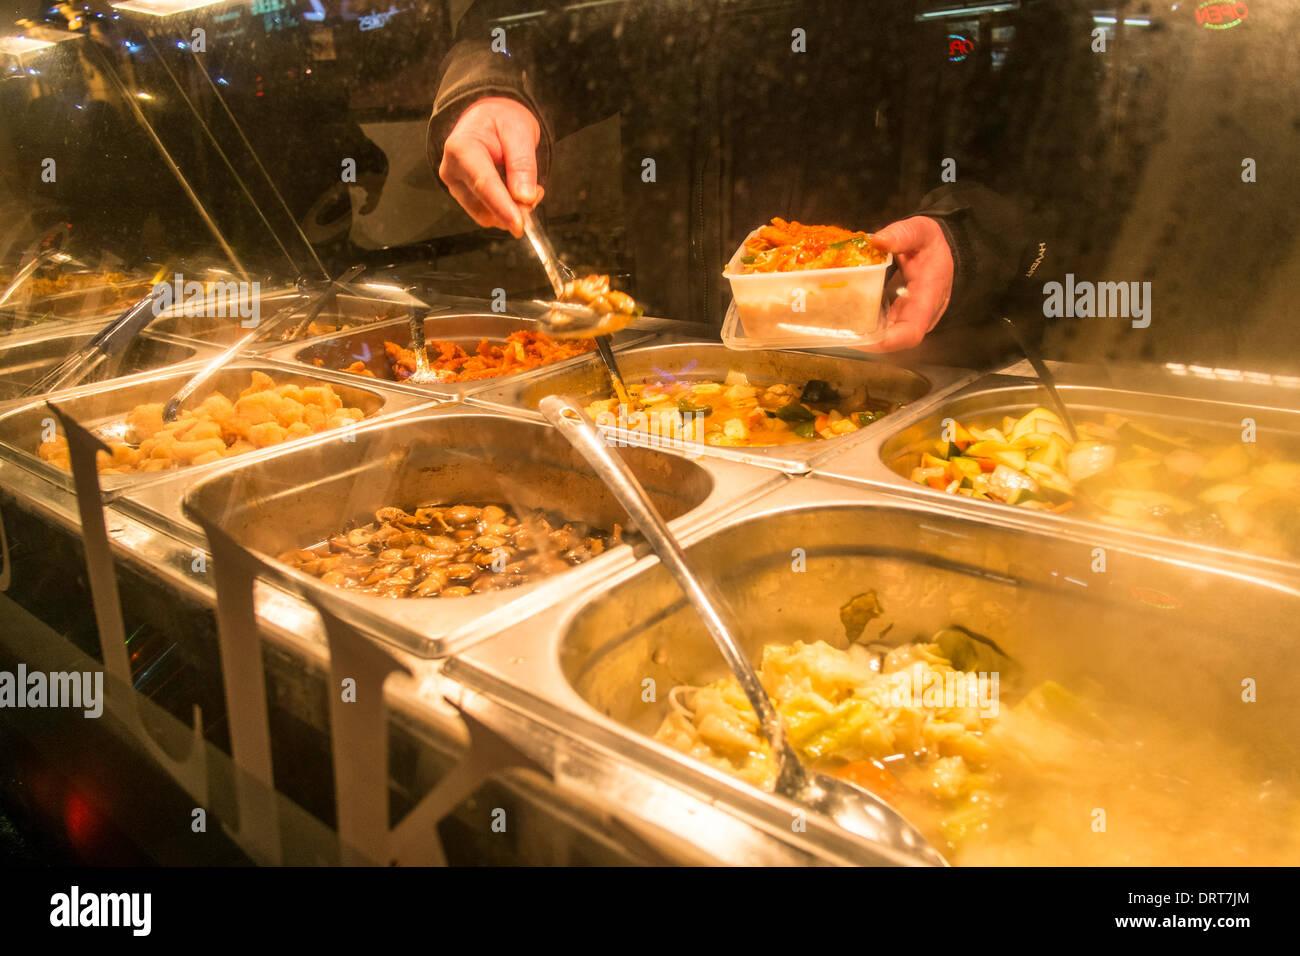 Fast Food Restaurant Uk Stock Photos & Fast Food ...